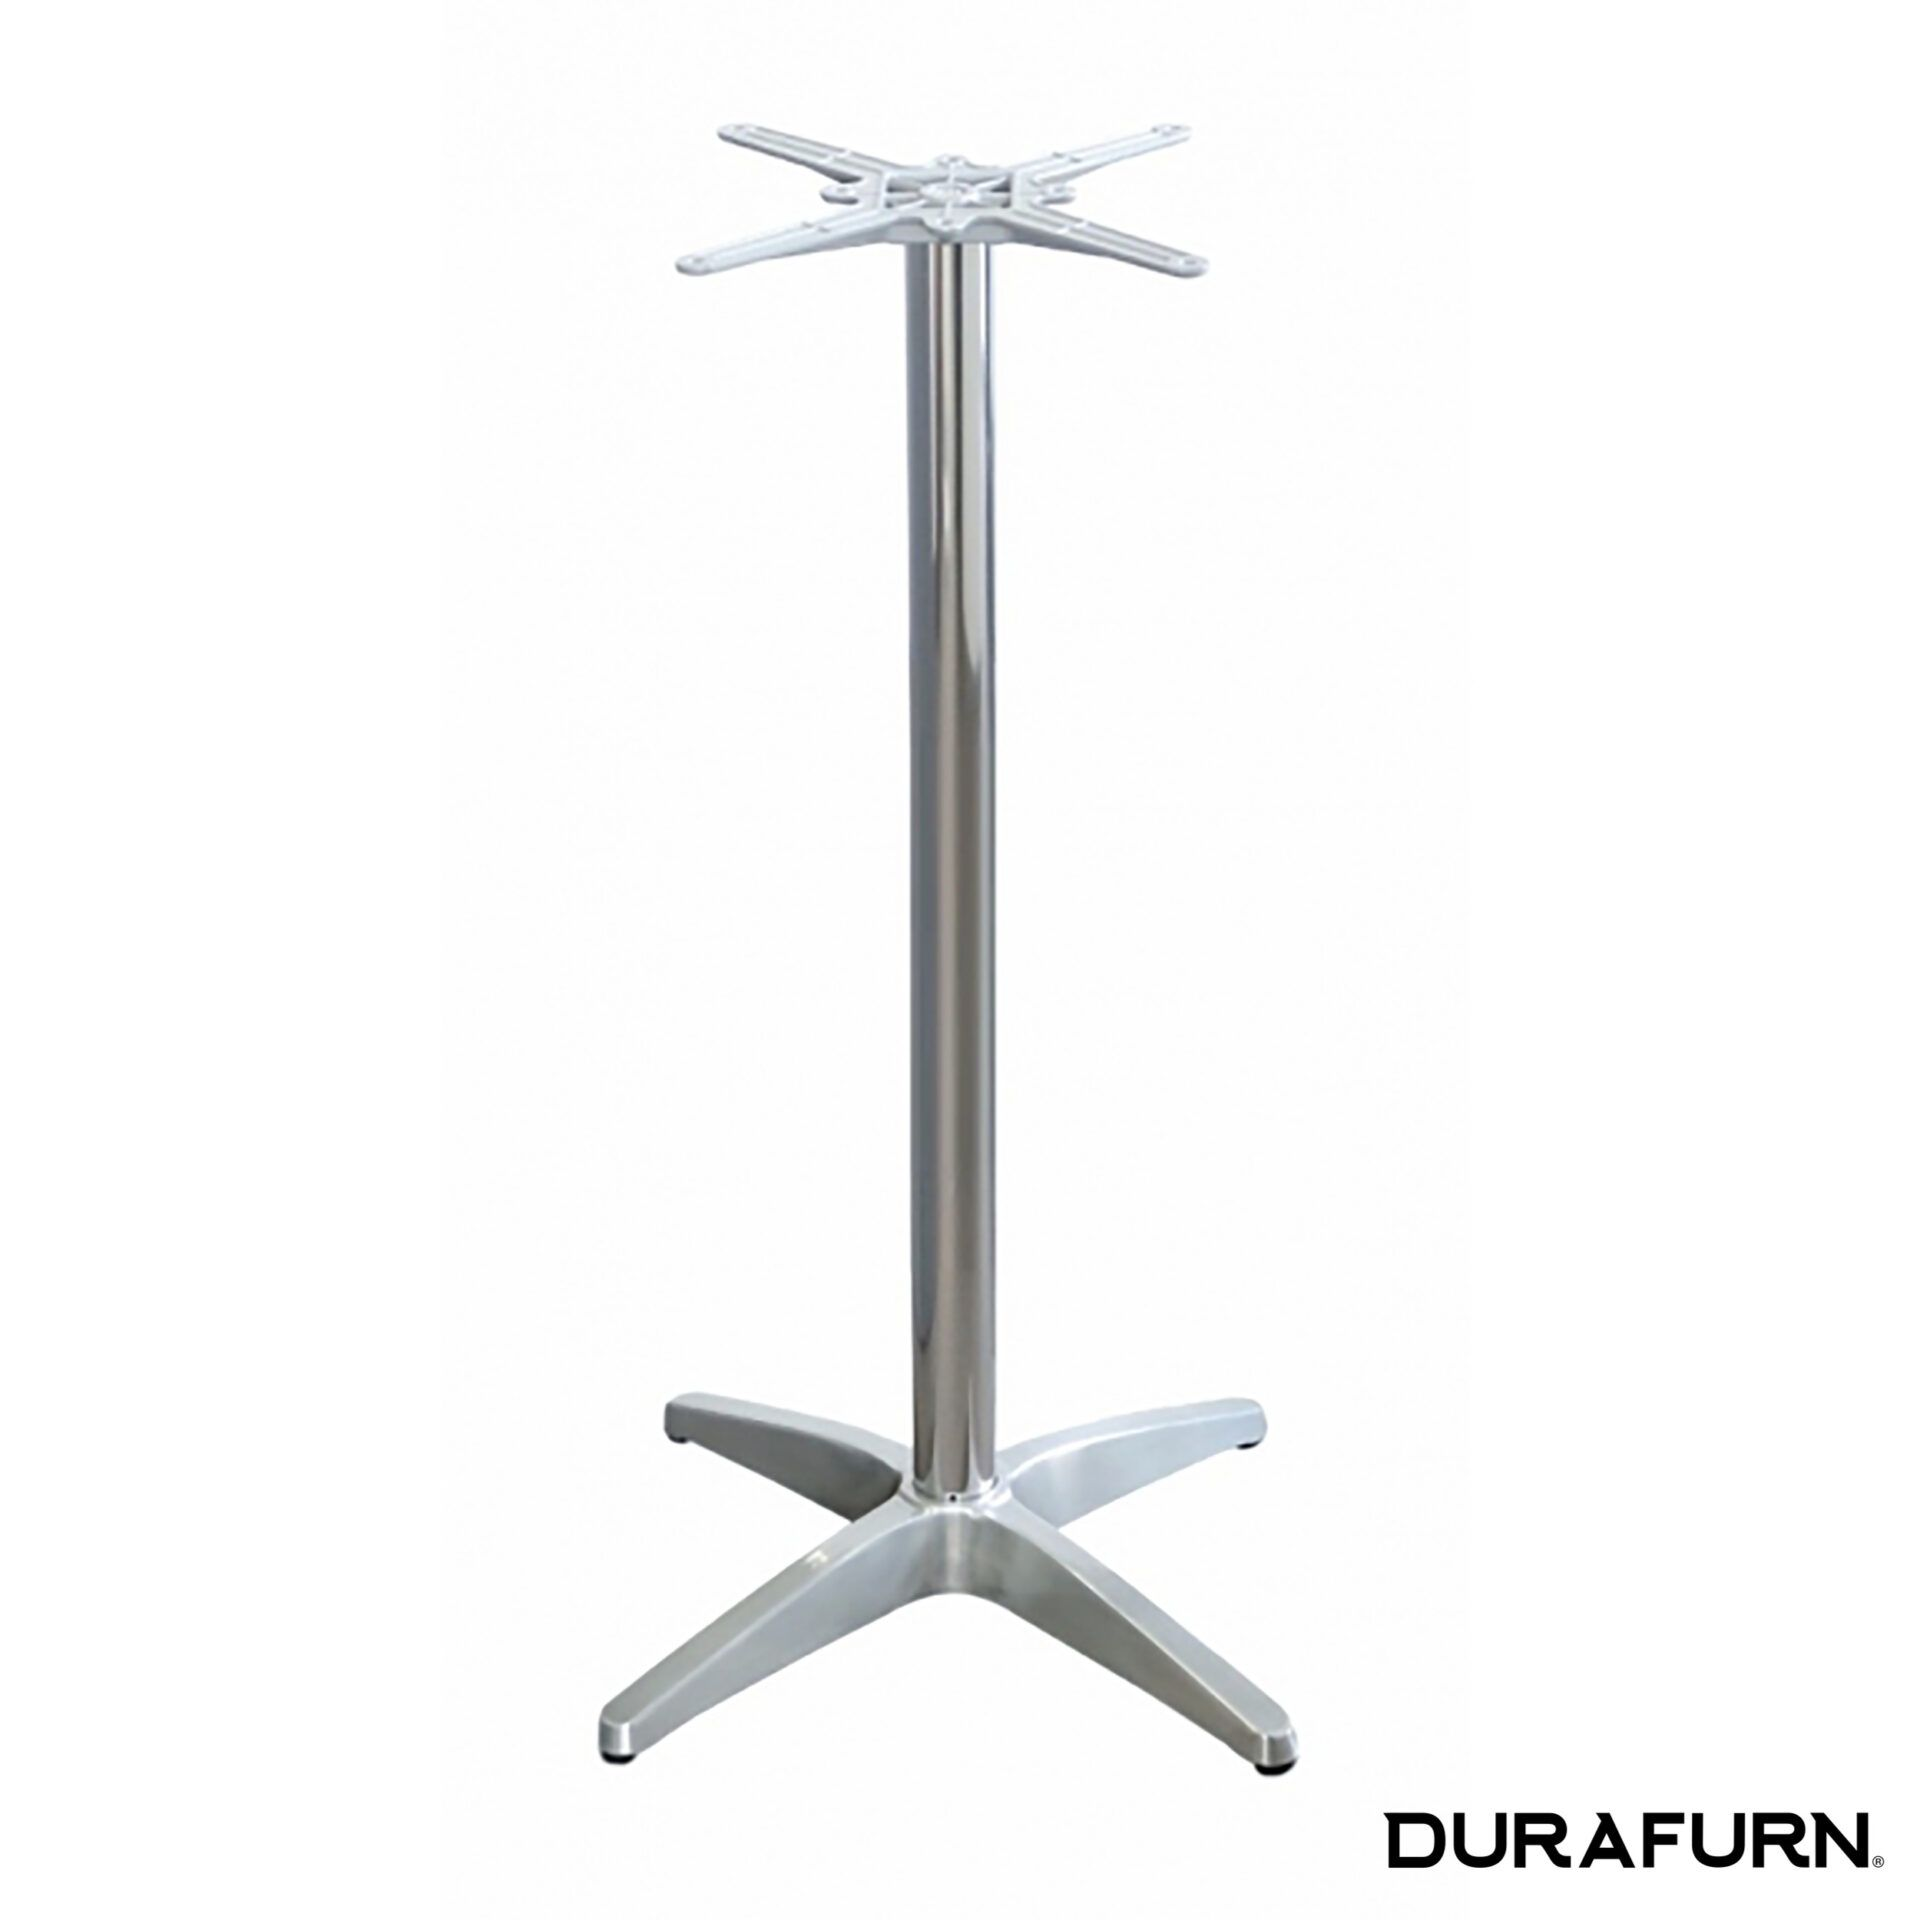 astoria aluminium bar height table base8m3qda